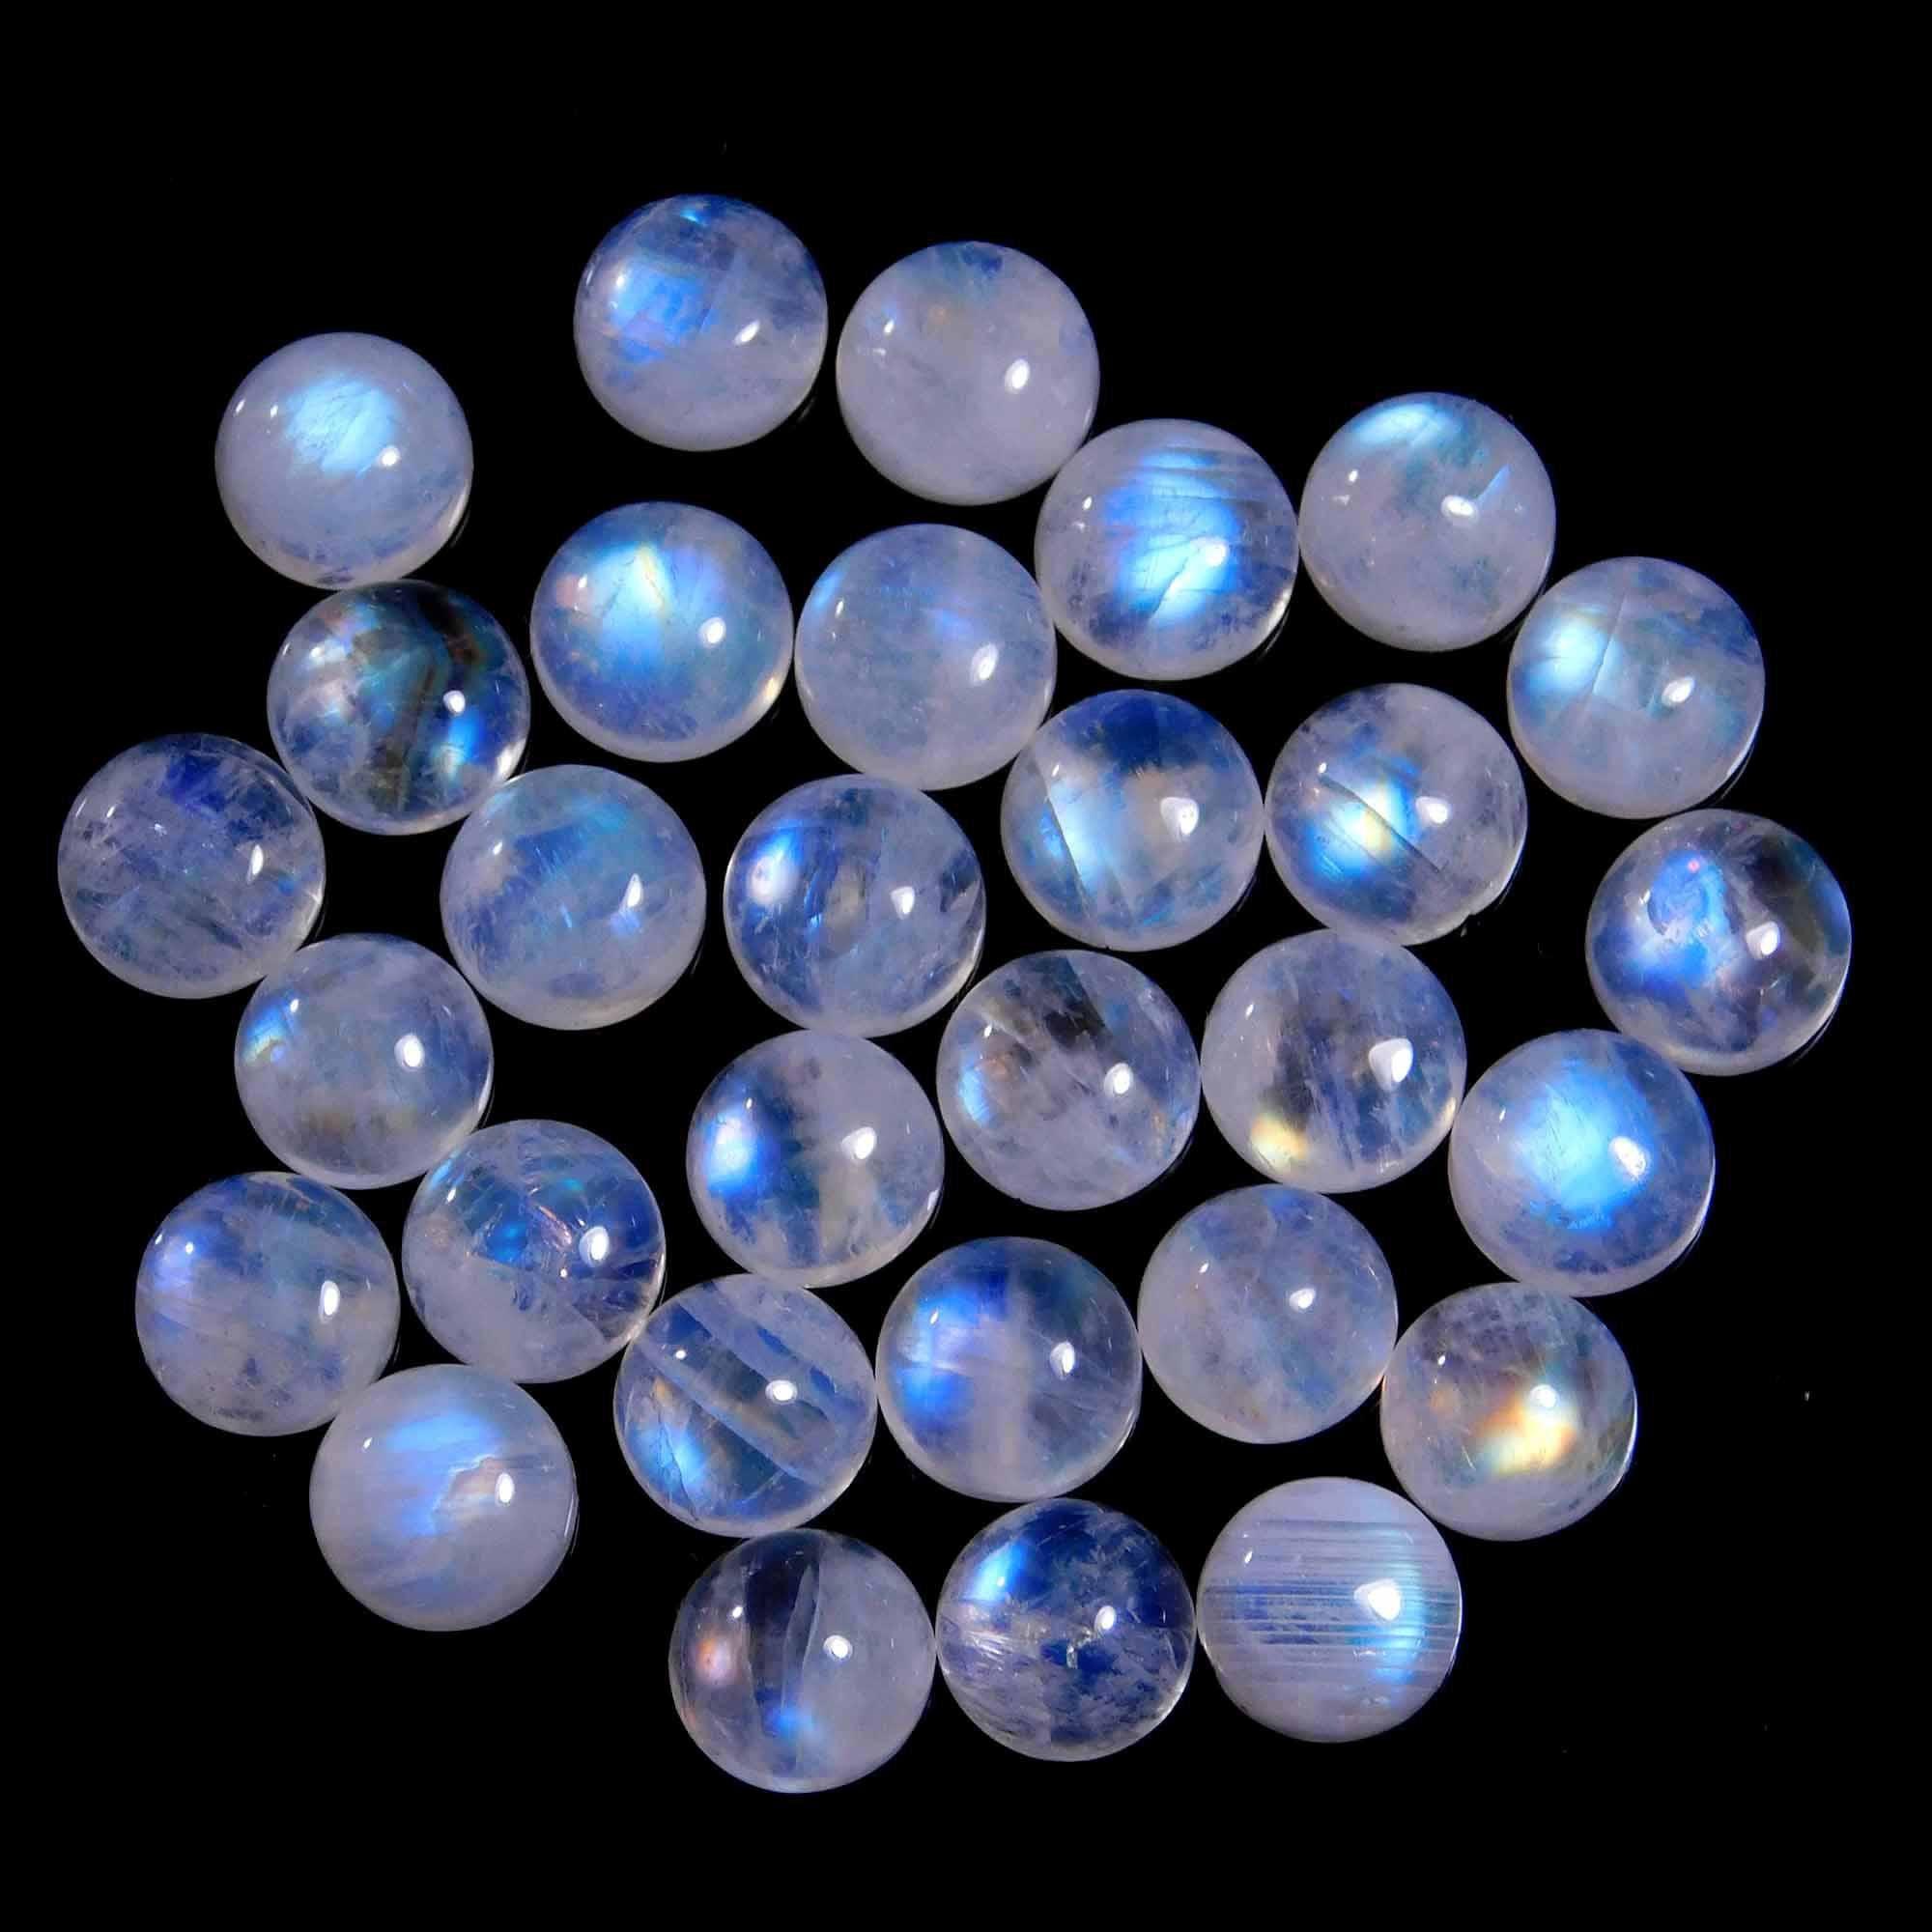 Rainbow Moonstone Natural Cabochon Semi Precious Loose Jewelry Making Gemstone